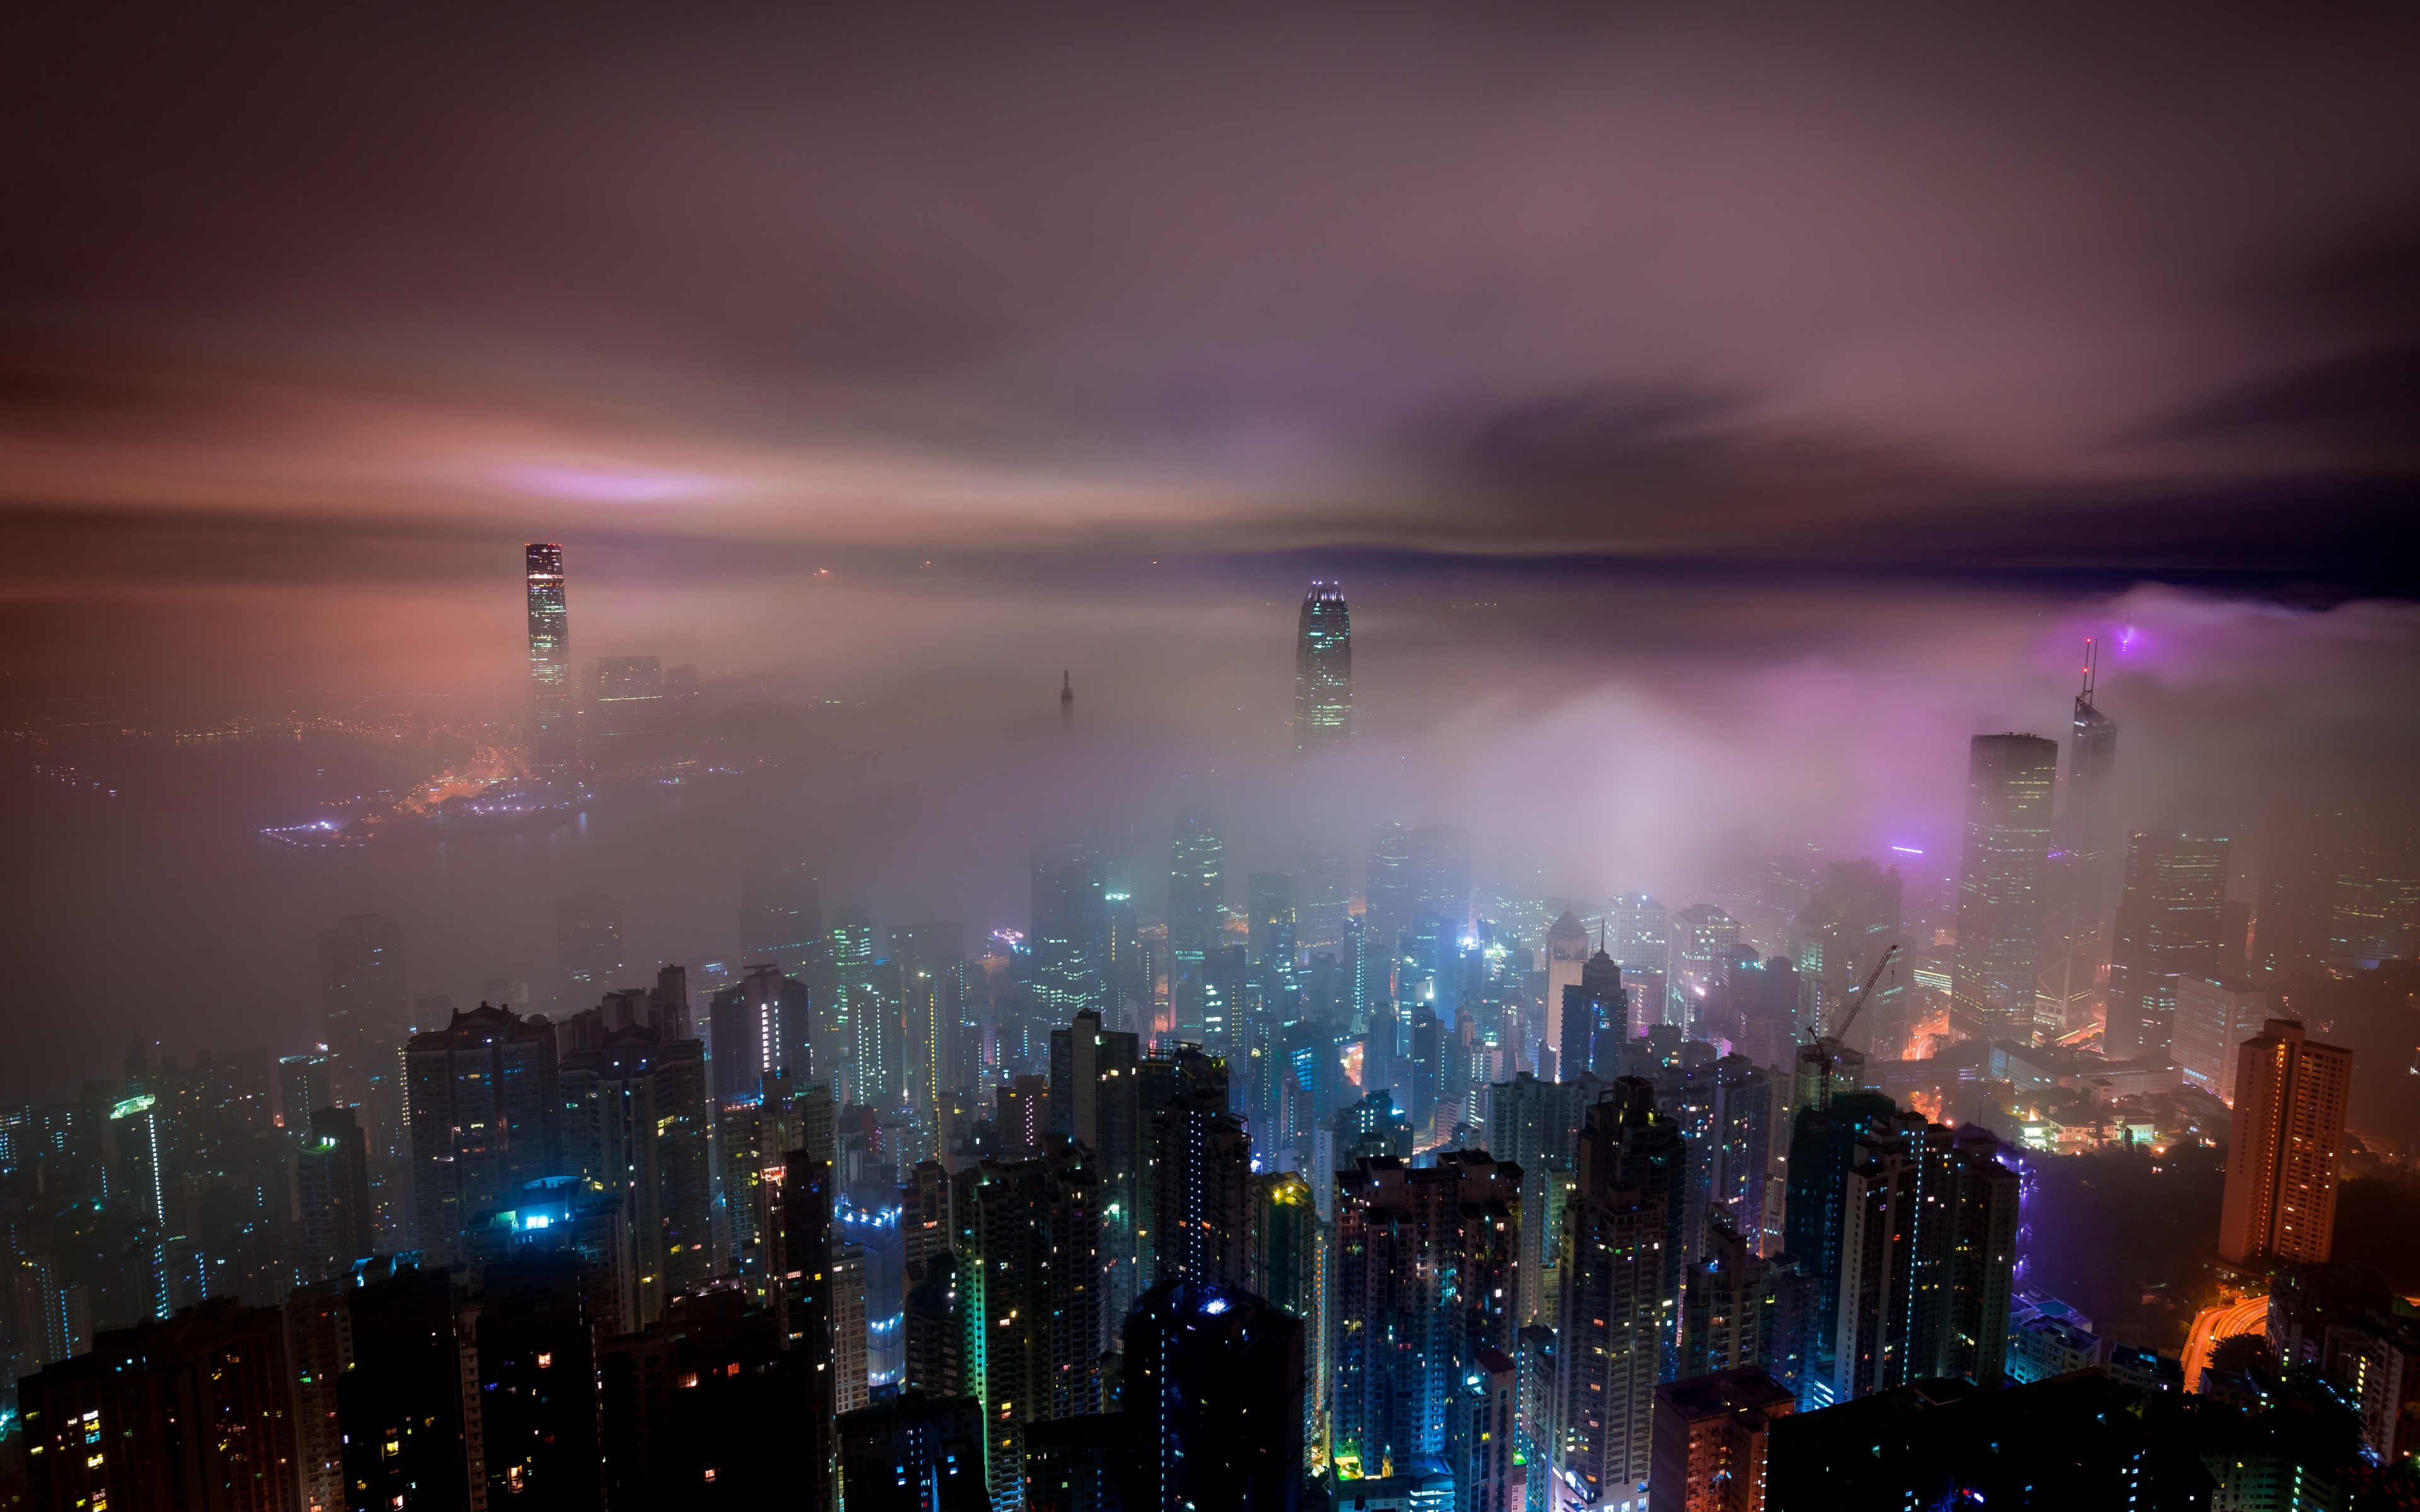 3840x2400 wallpaper Clouds, aerial view, hong kong, city, night, buildings, mist